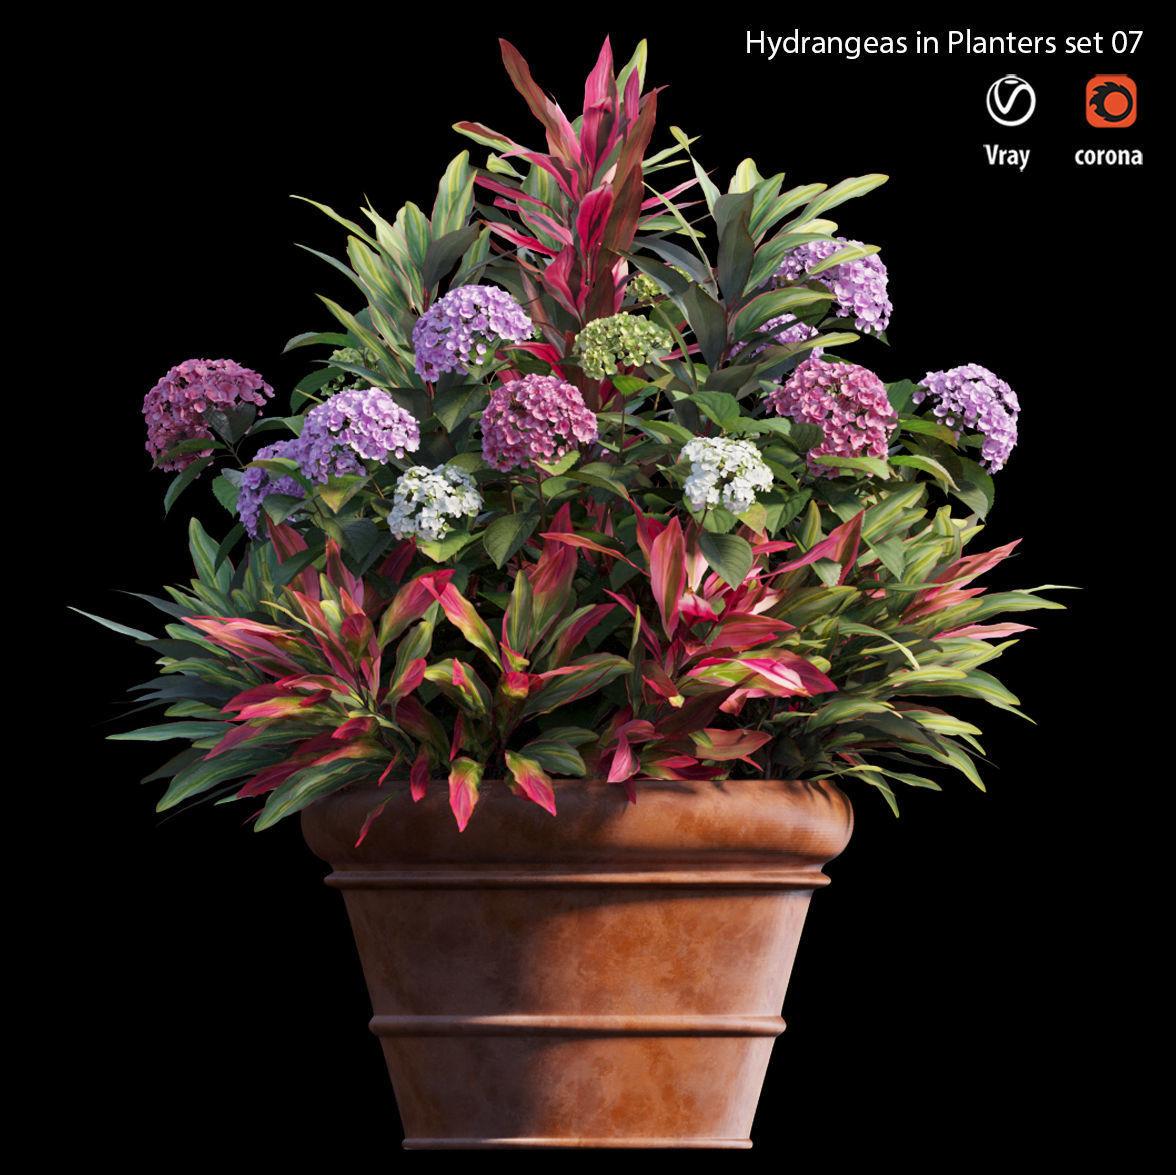 Hydrangea in planters set 07